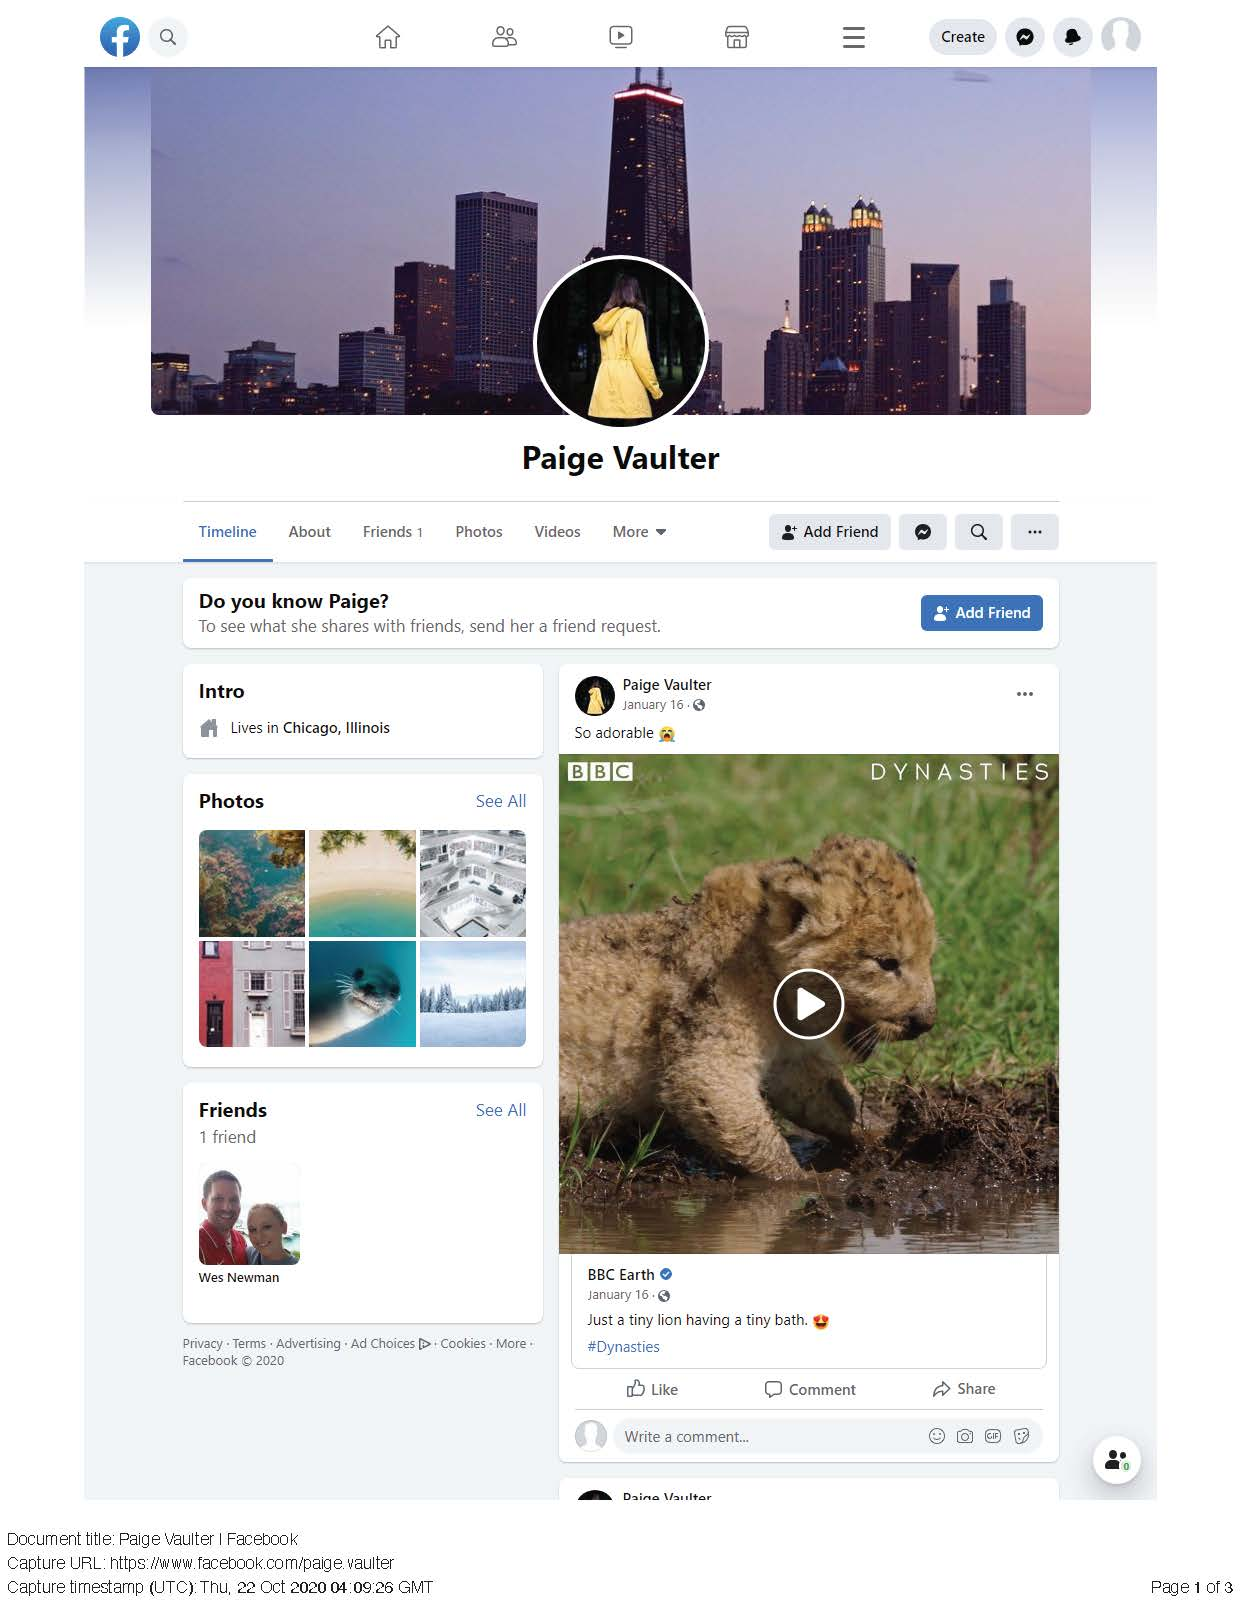 Page Vault Facebook Capture